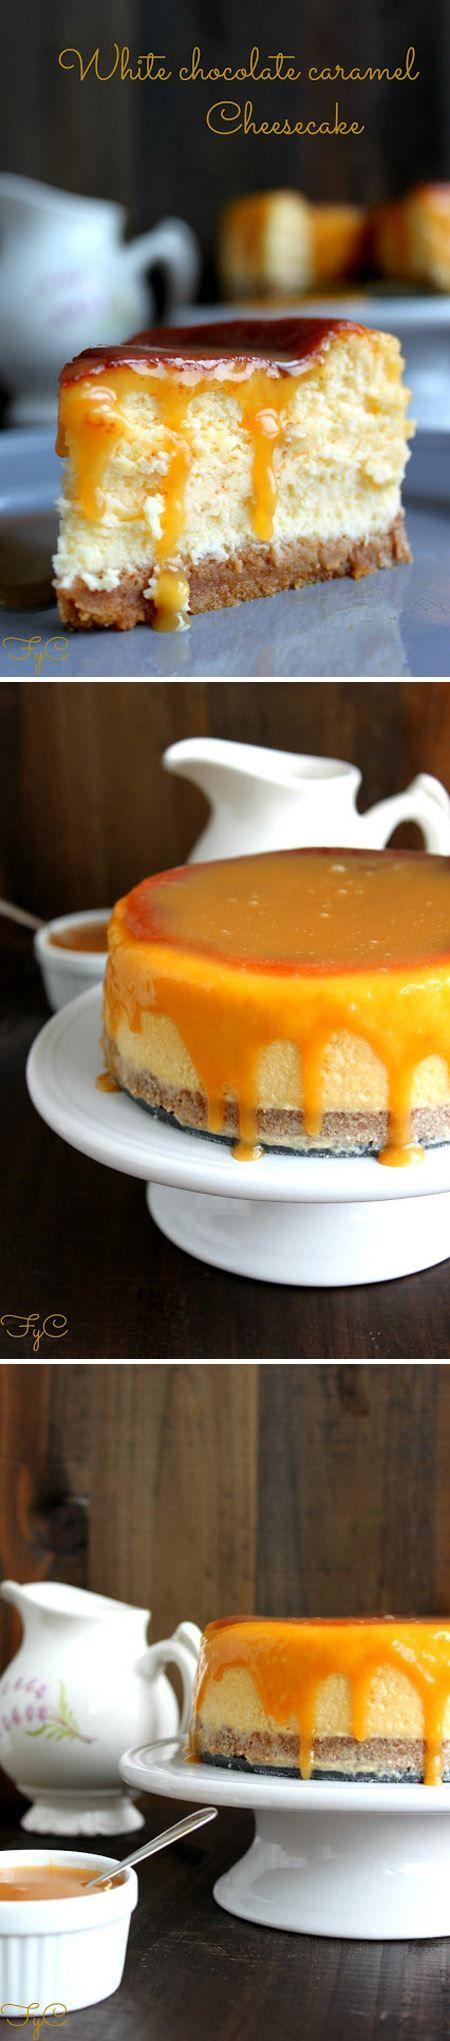 chocolate-blanco-cheesecake-1-pecados-reposteria   https://lomejordelaweb.es/